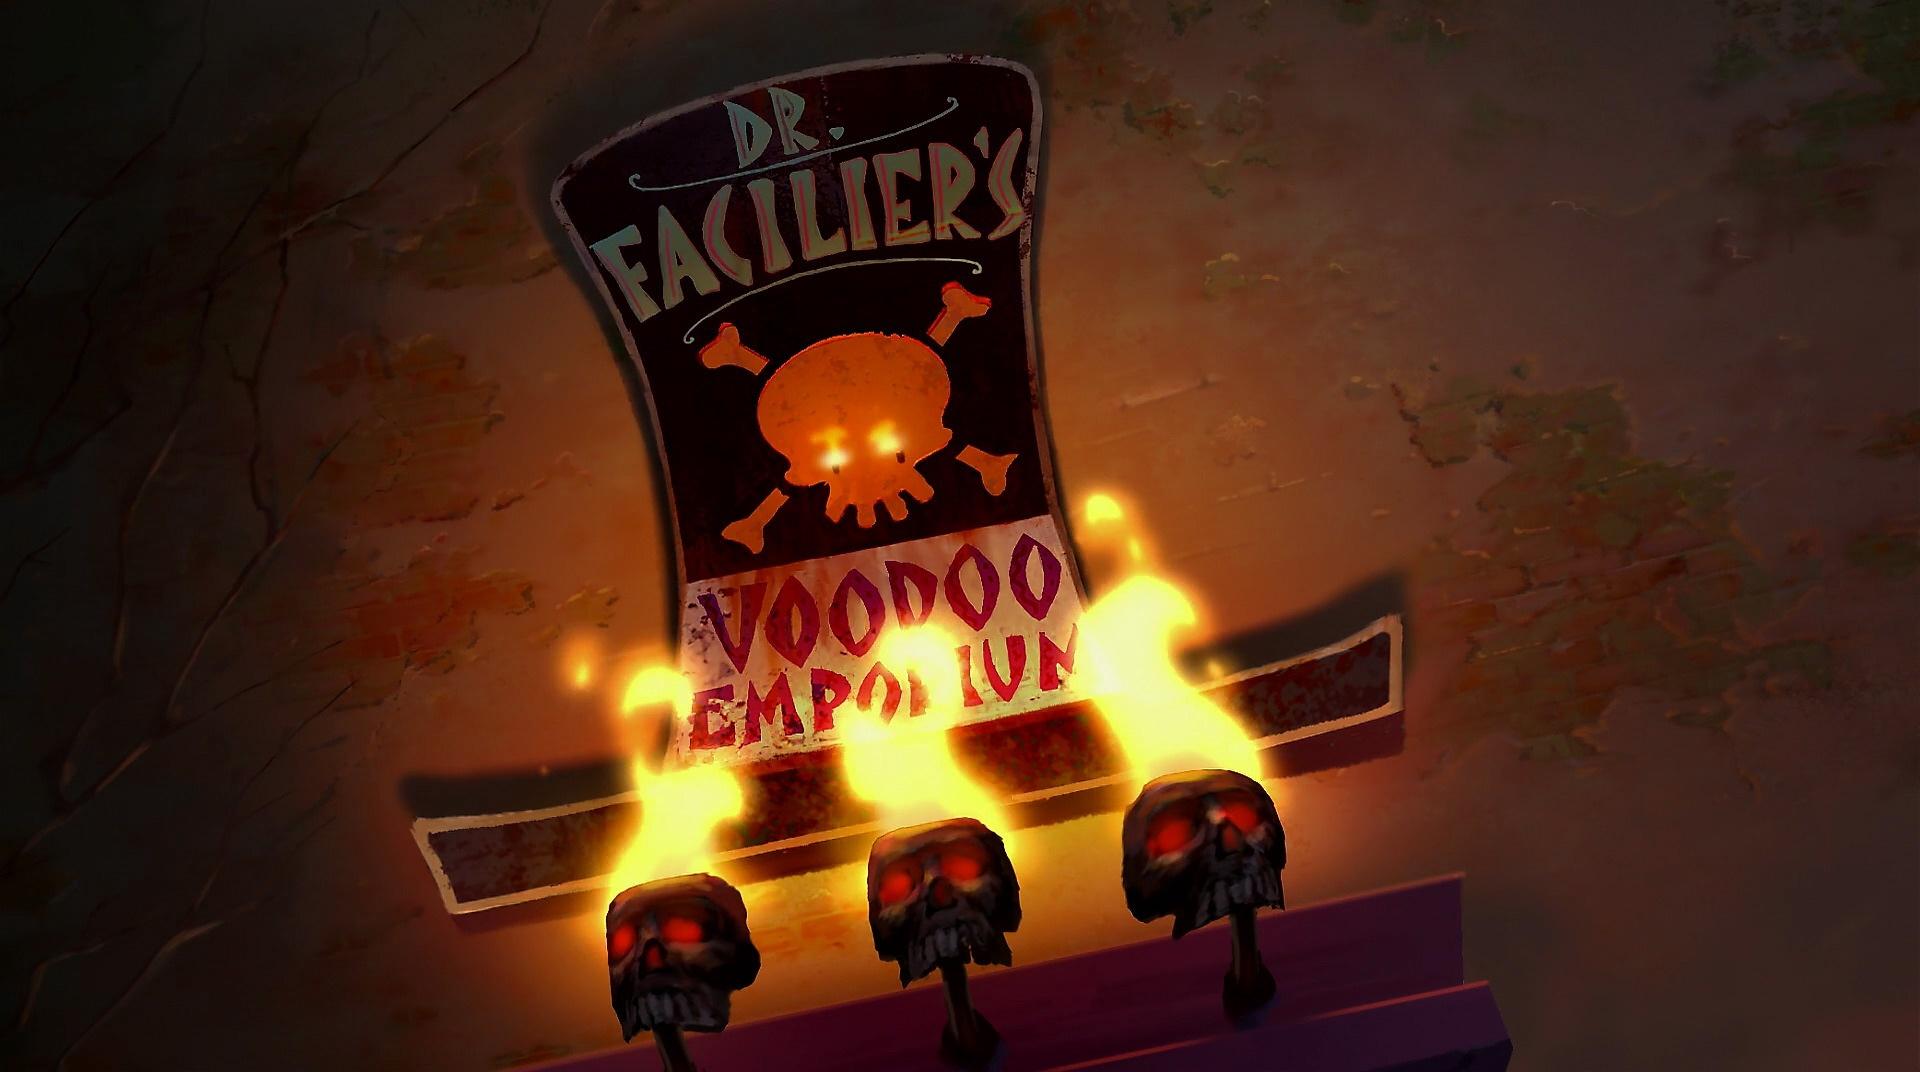 Dr. Facilier's Voodoo Emporium